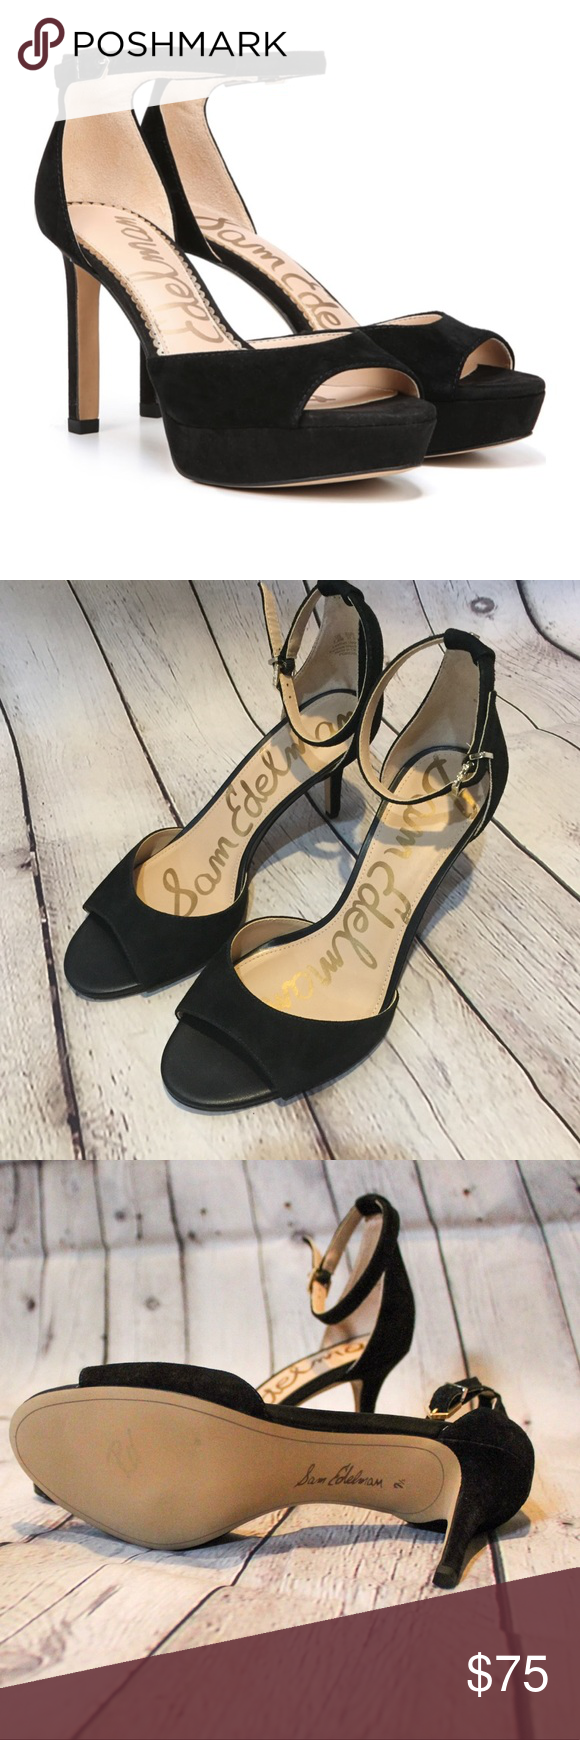 726184cf684 Sam Edelman Suede Jerin heels black condition  preloved